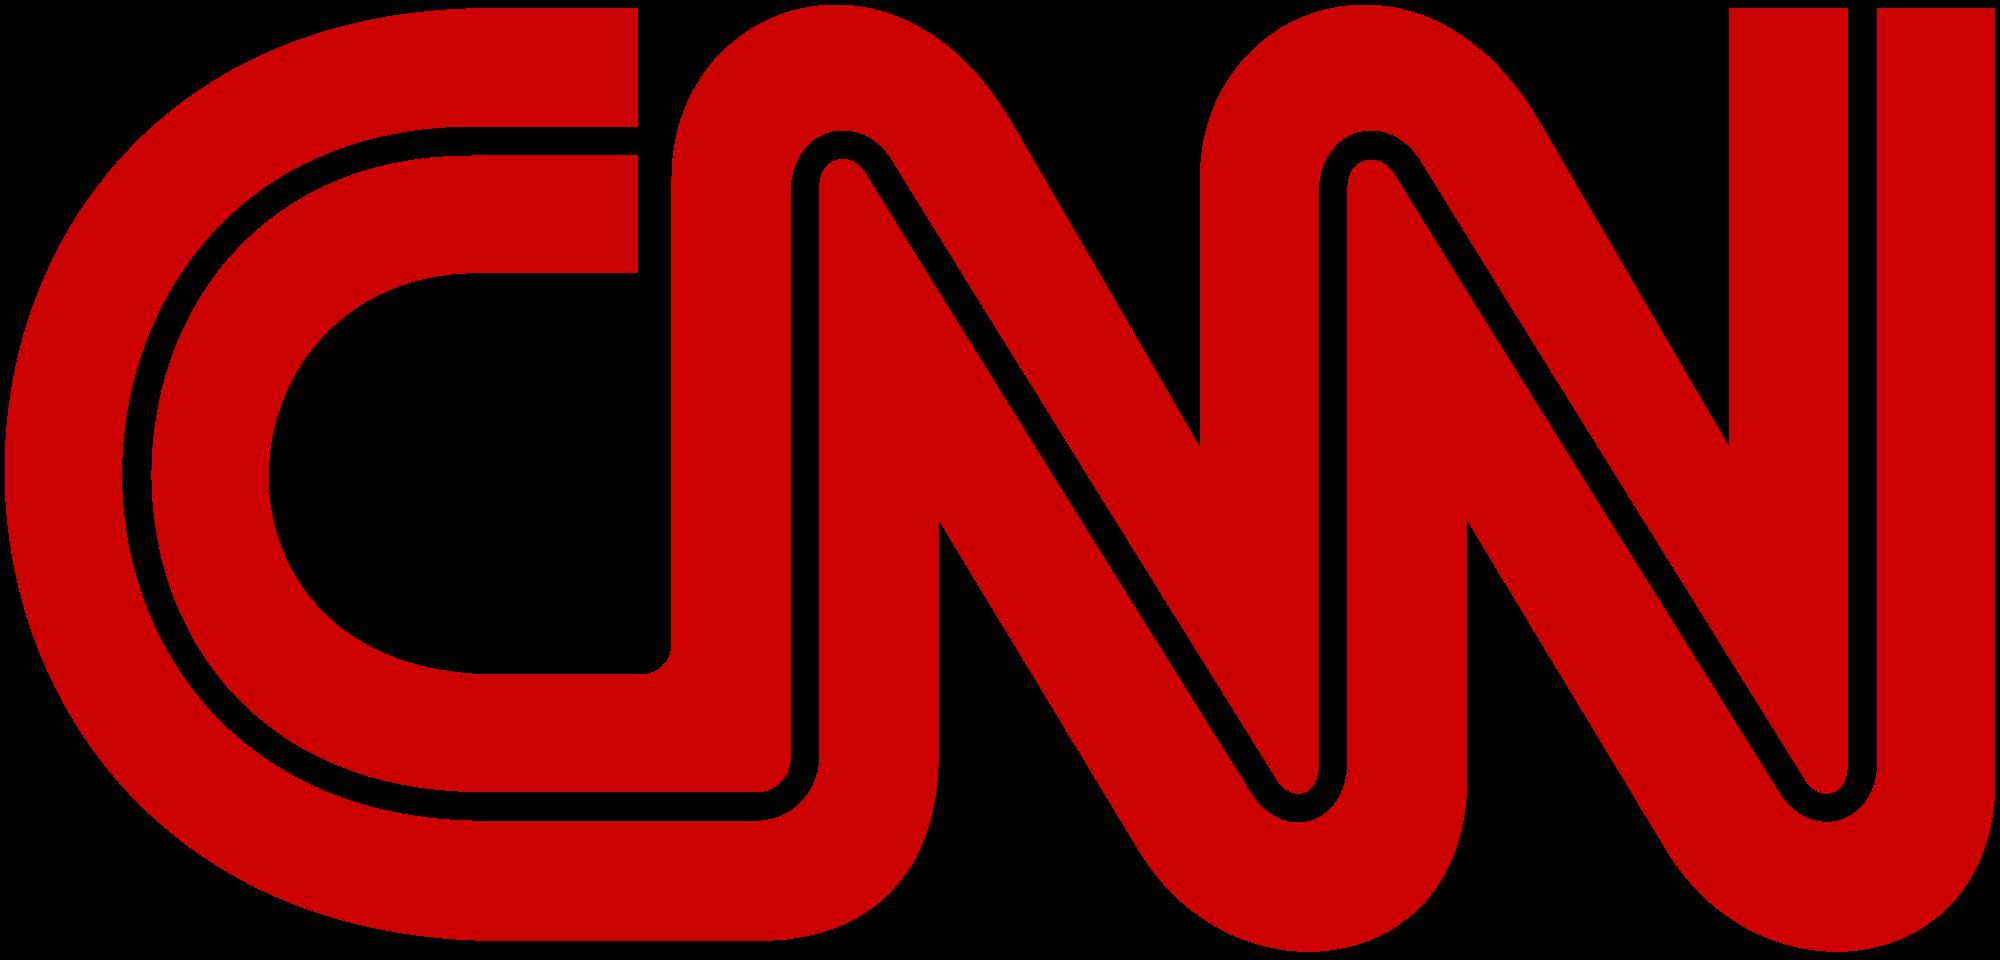 UIY_CNN_logo.png